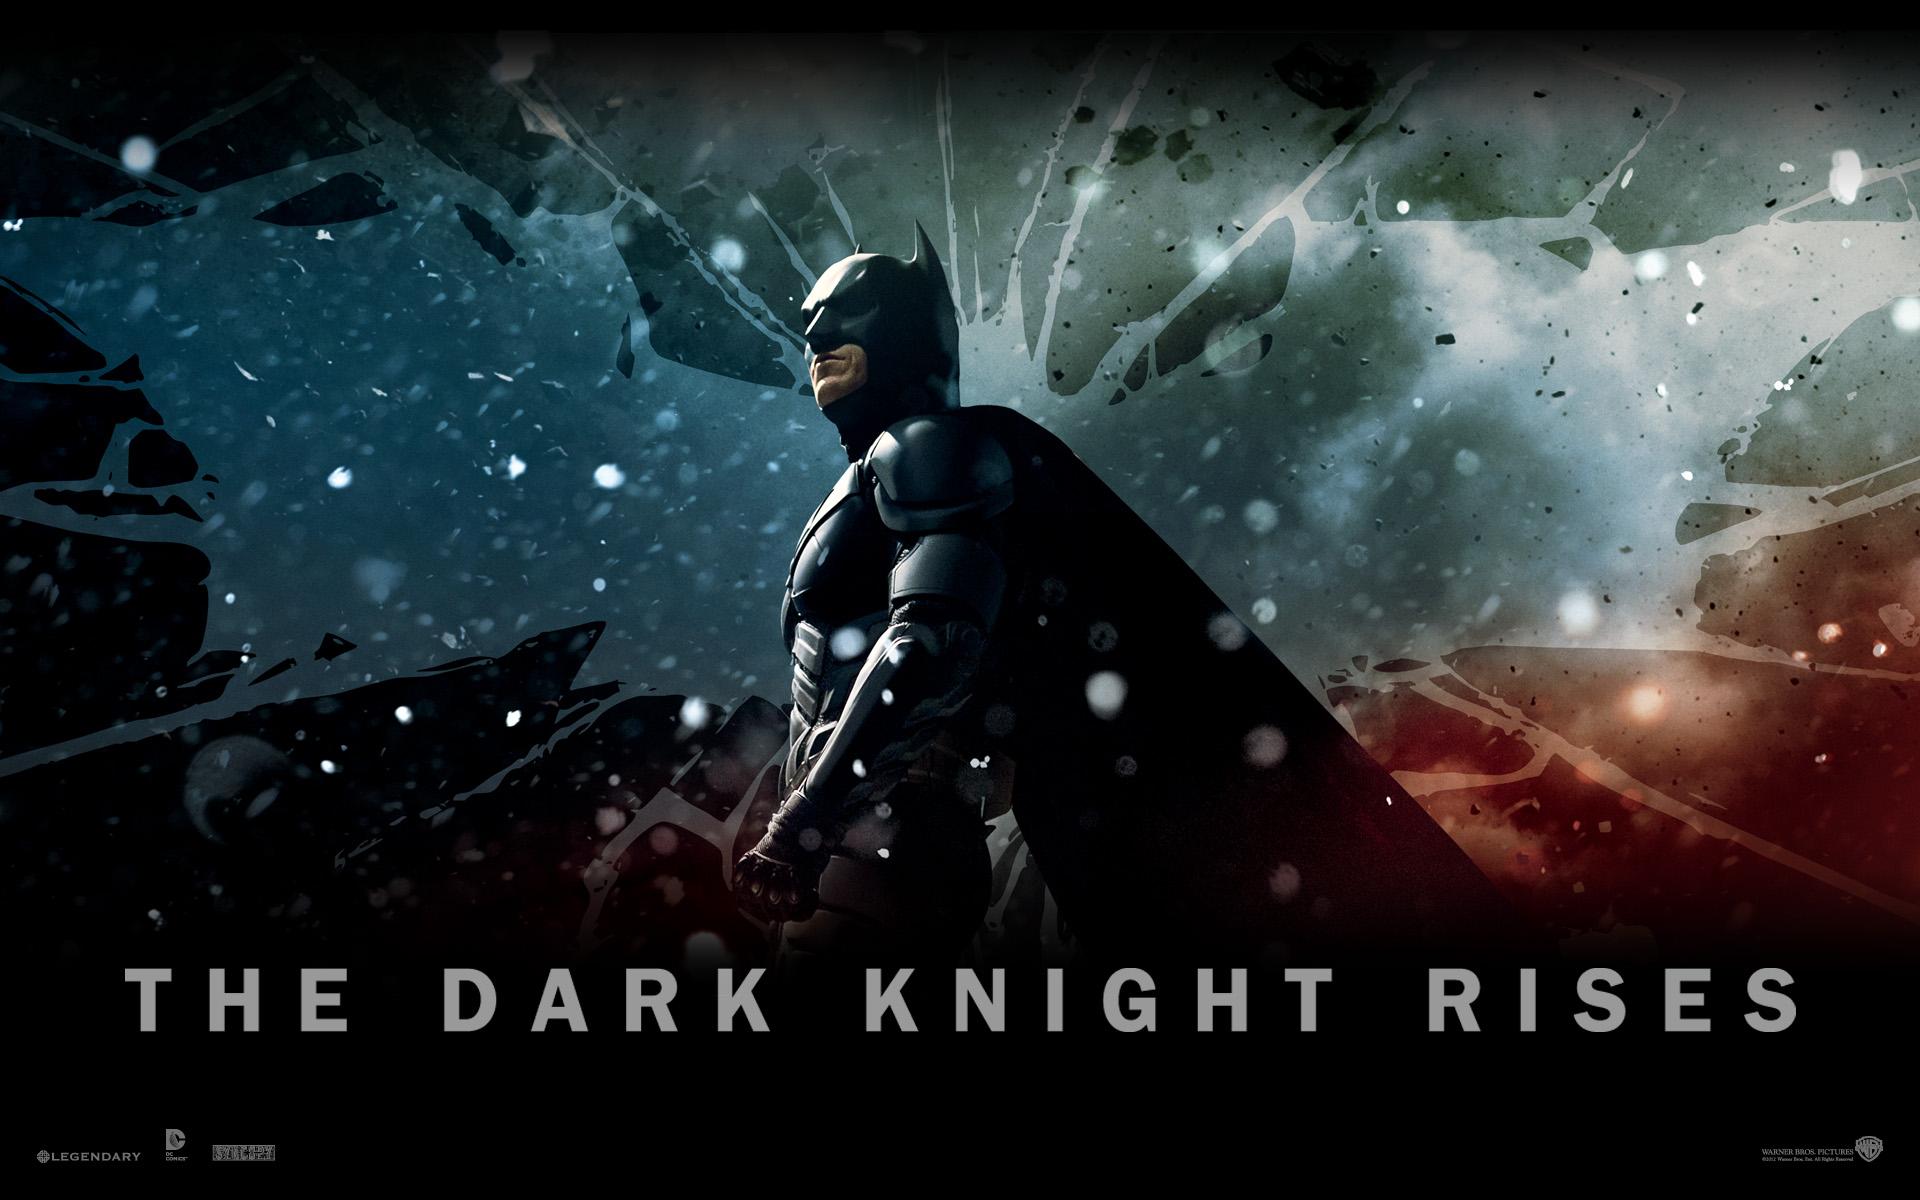 The Dark Knight Rises Official Wallpaper